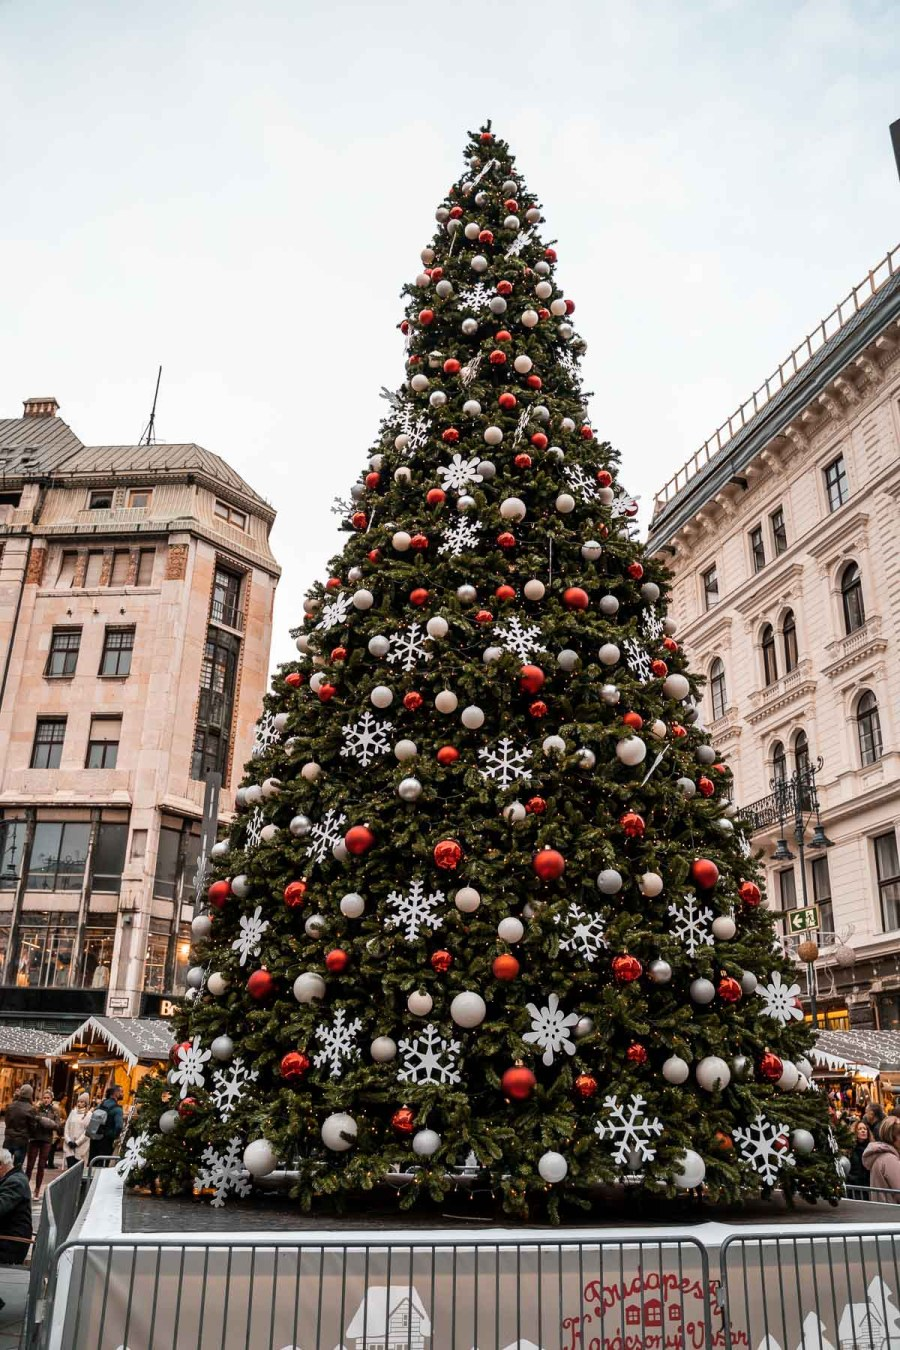 Christmas tree at Vörösmarty square in Budapest